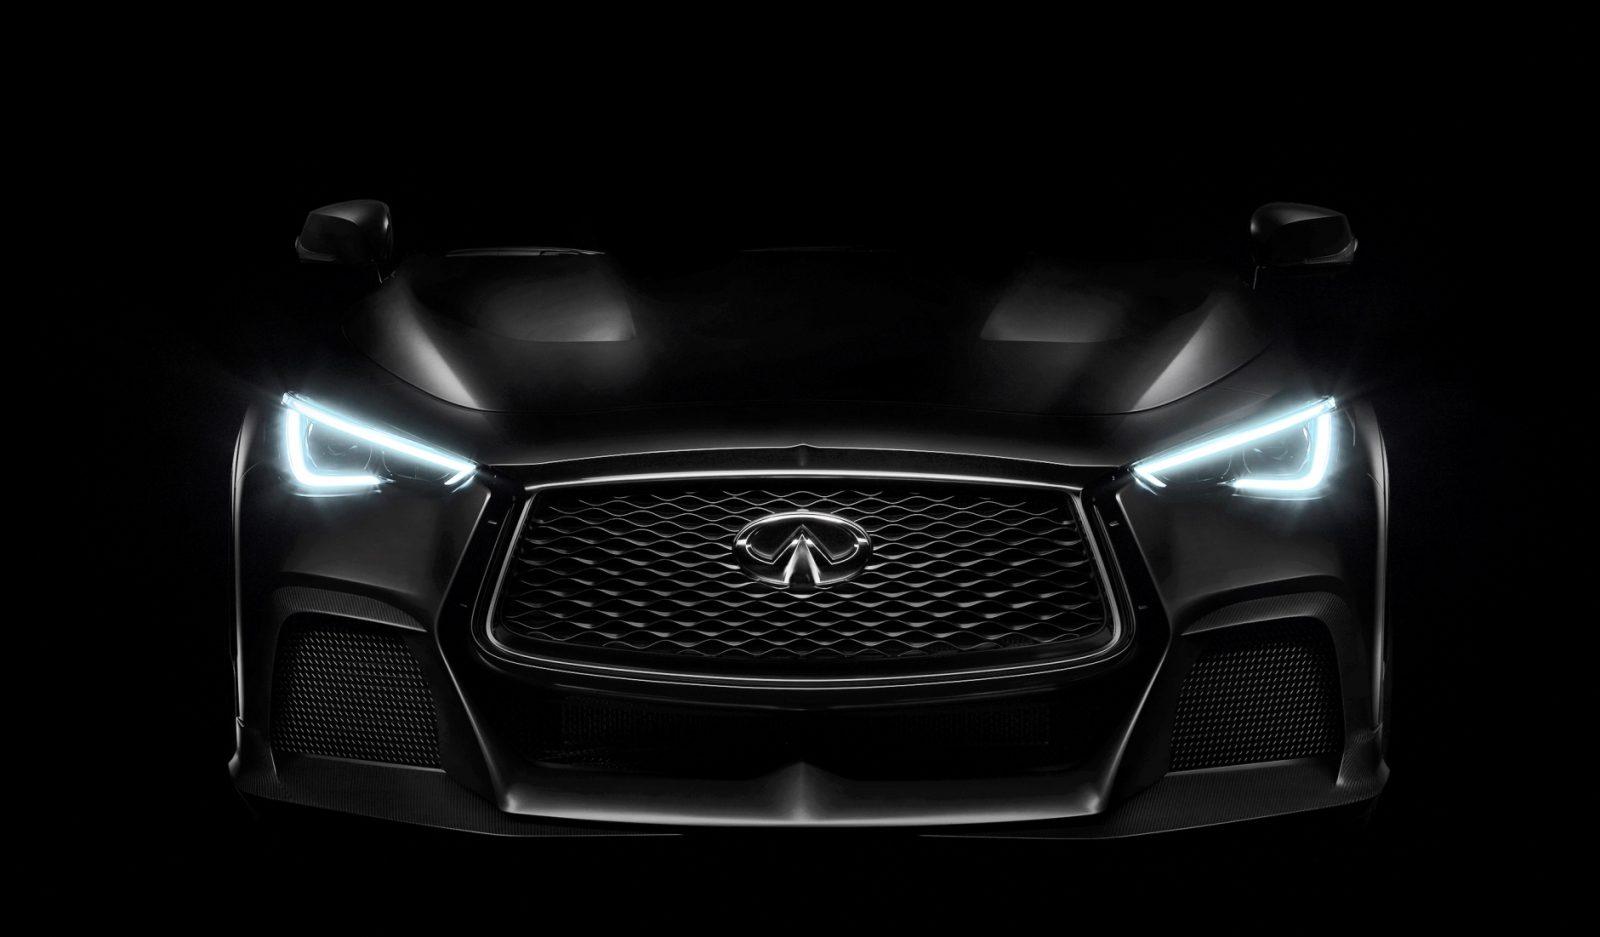 2017 Infiniti Q60 Project Black S Concept